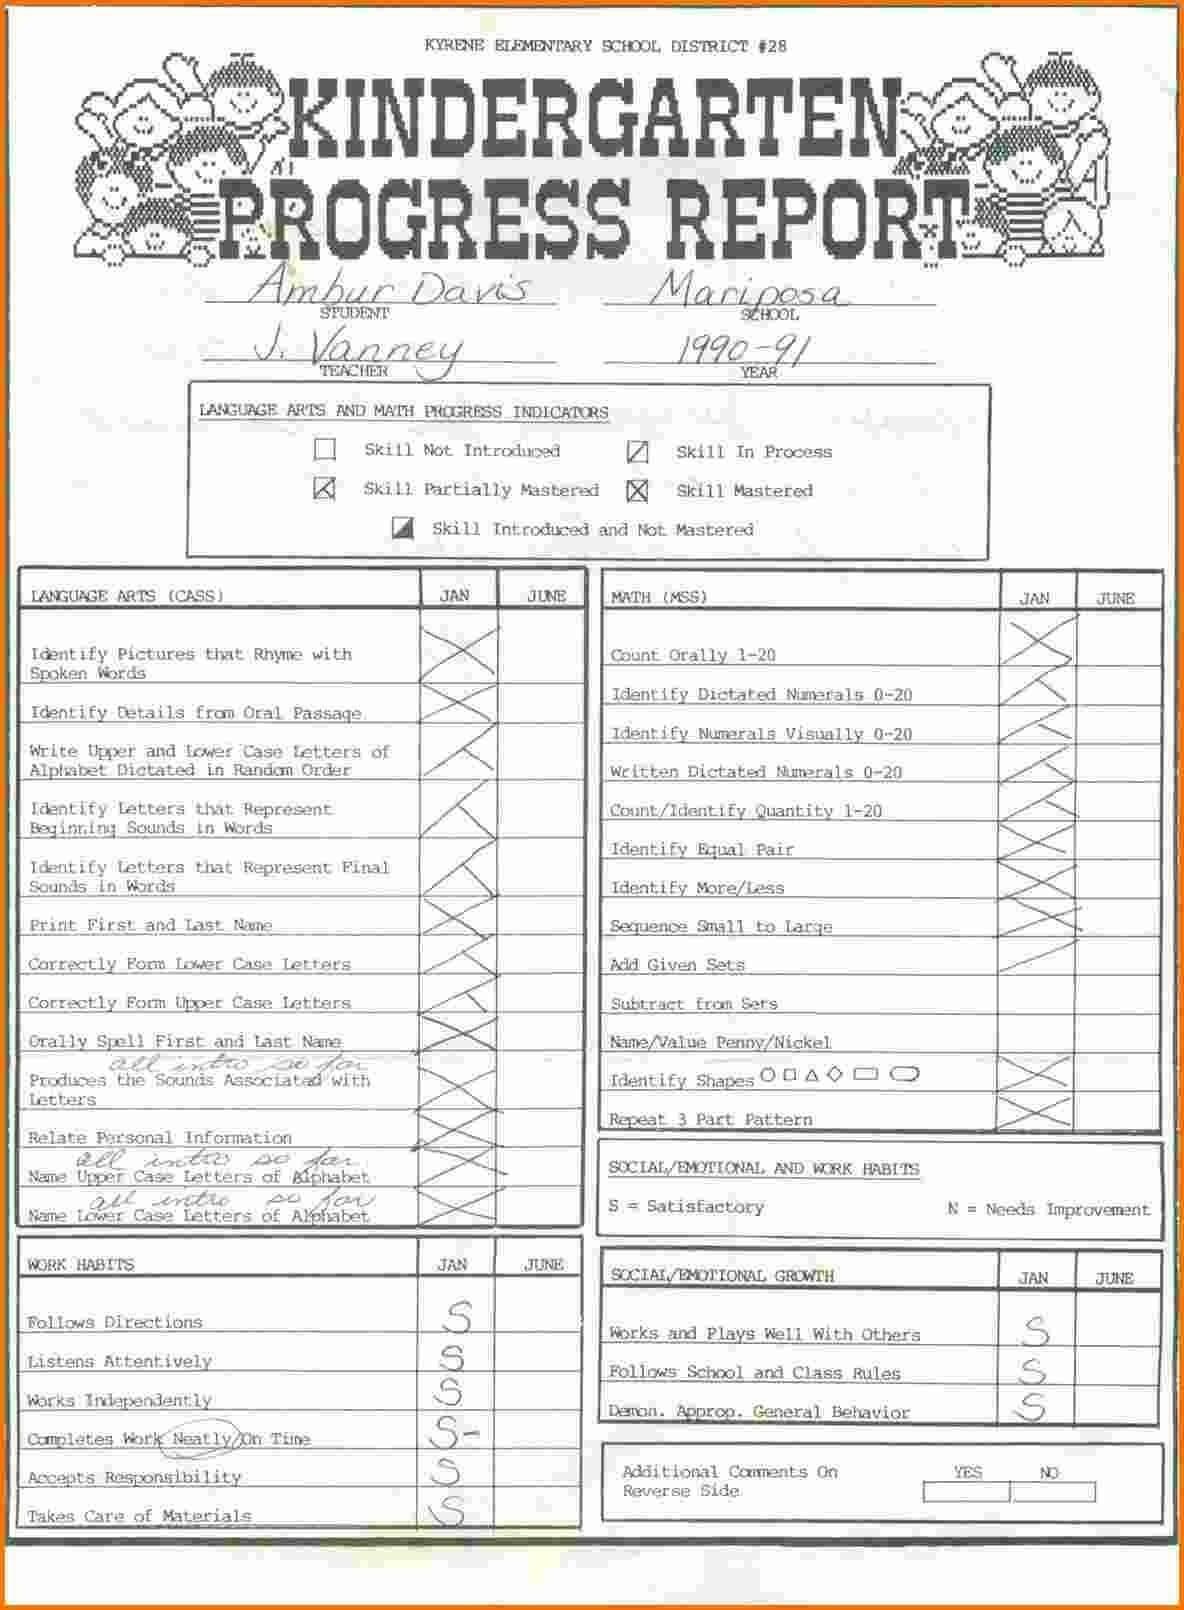 015 Kindergarten Report Card Template Ideas Templates High For Kindergarten Report Card Template